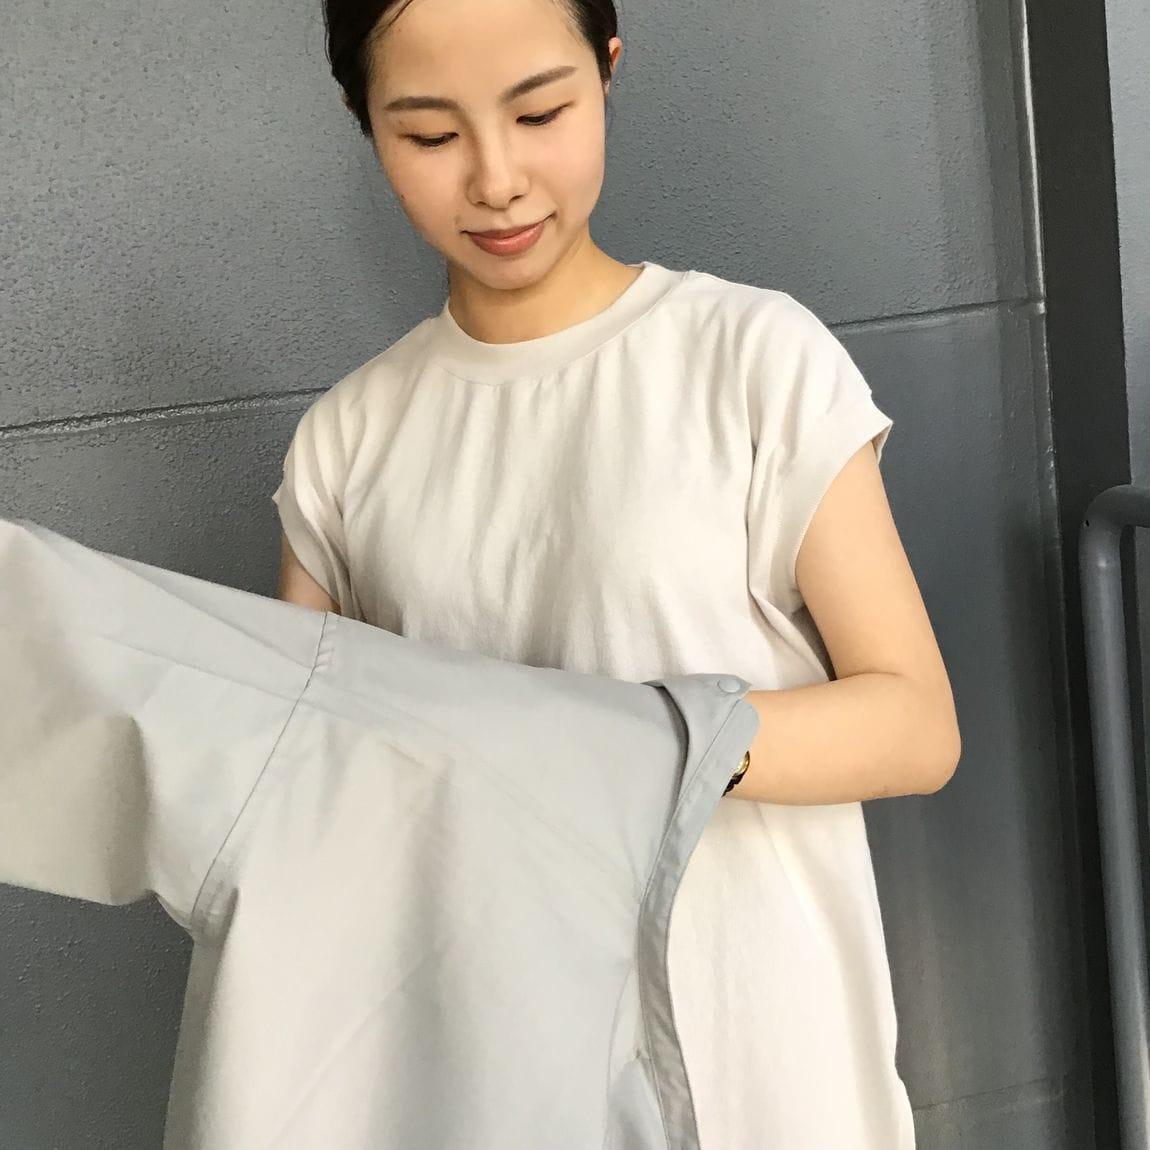 【PRALIVA】MUJI wear#16